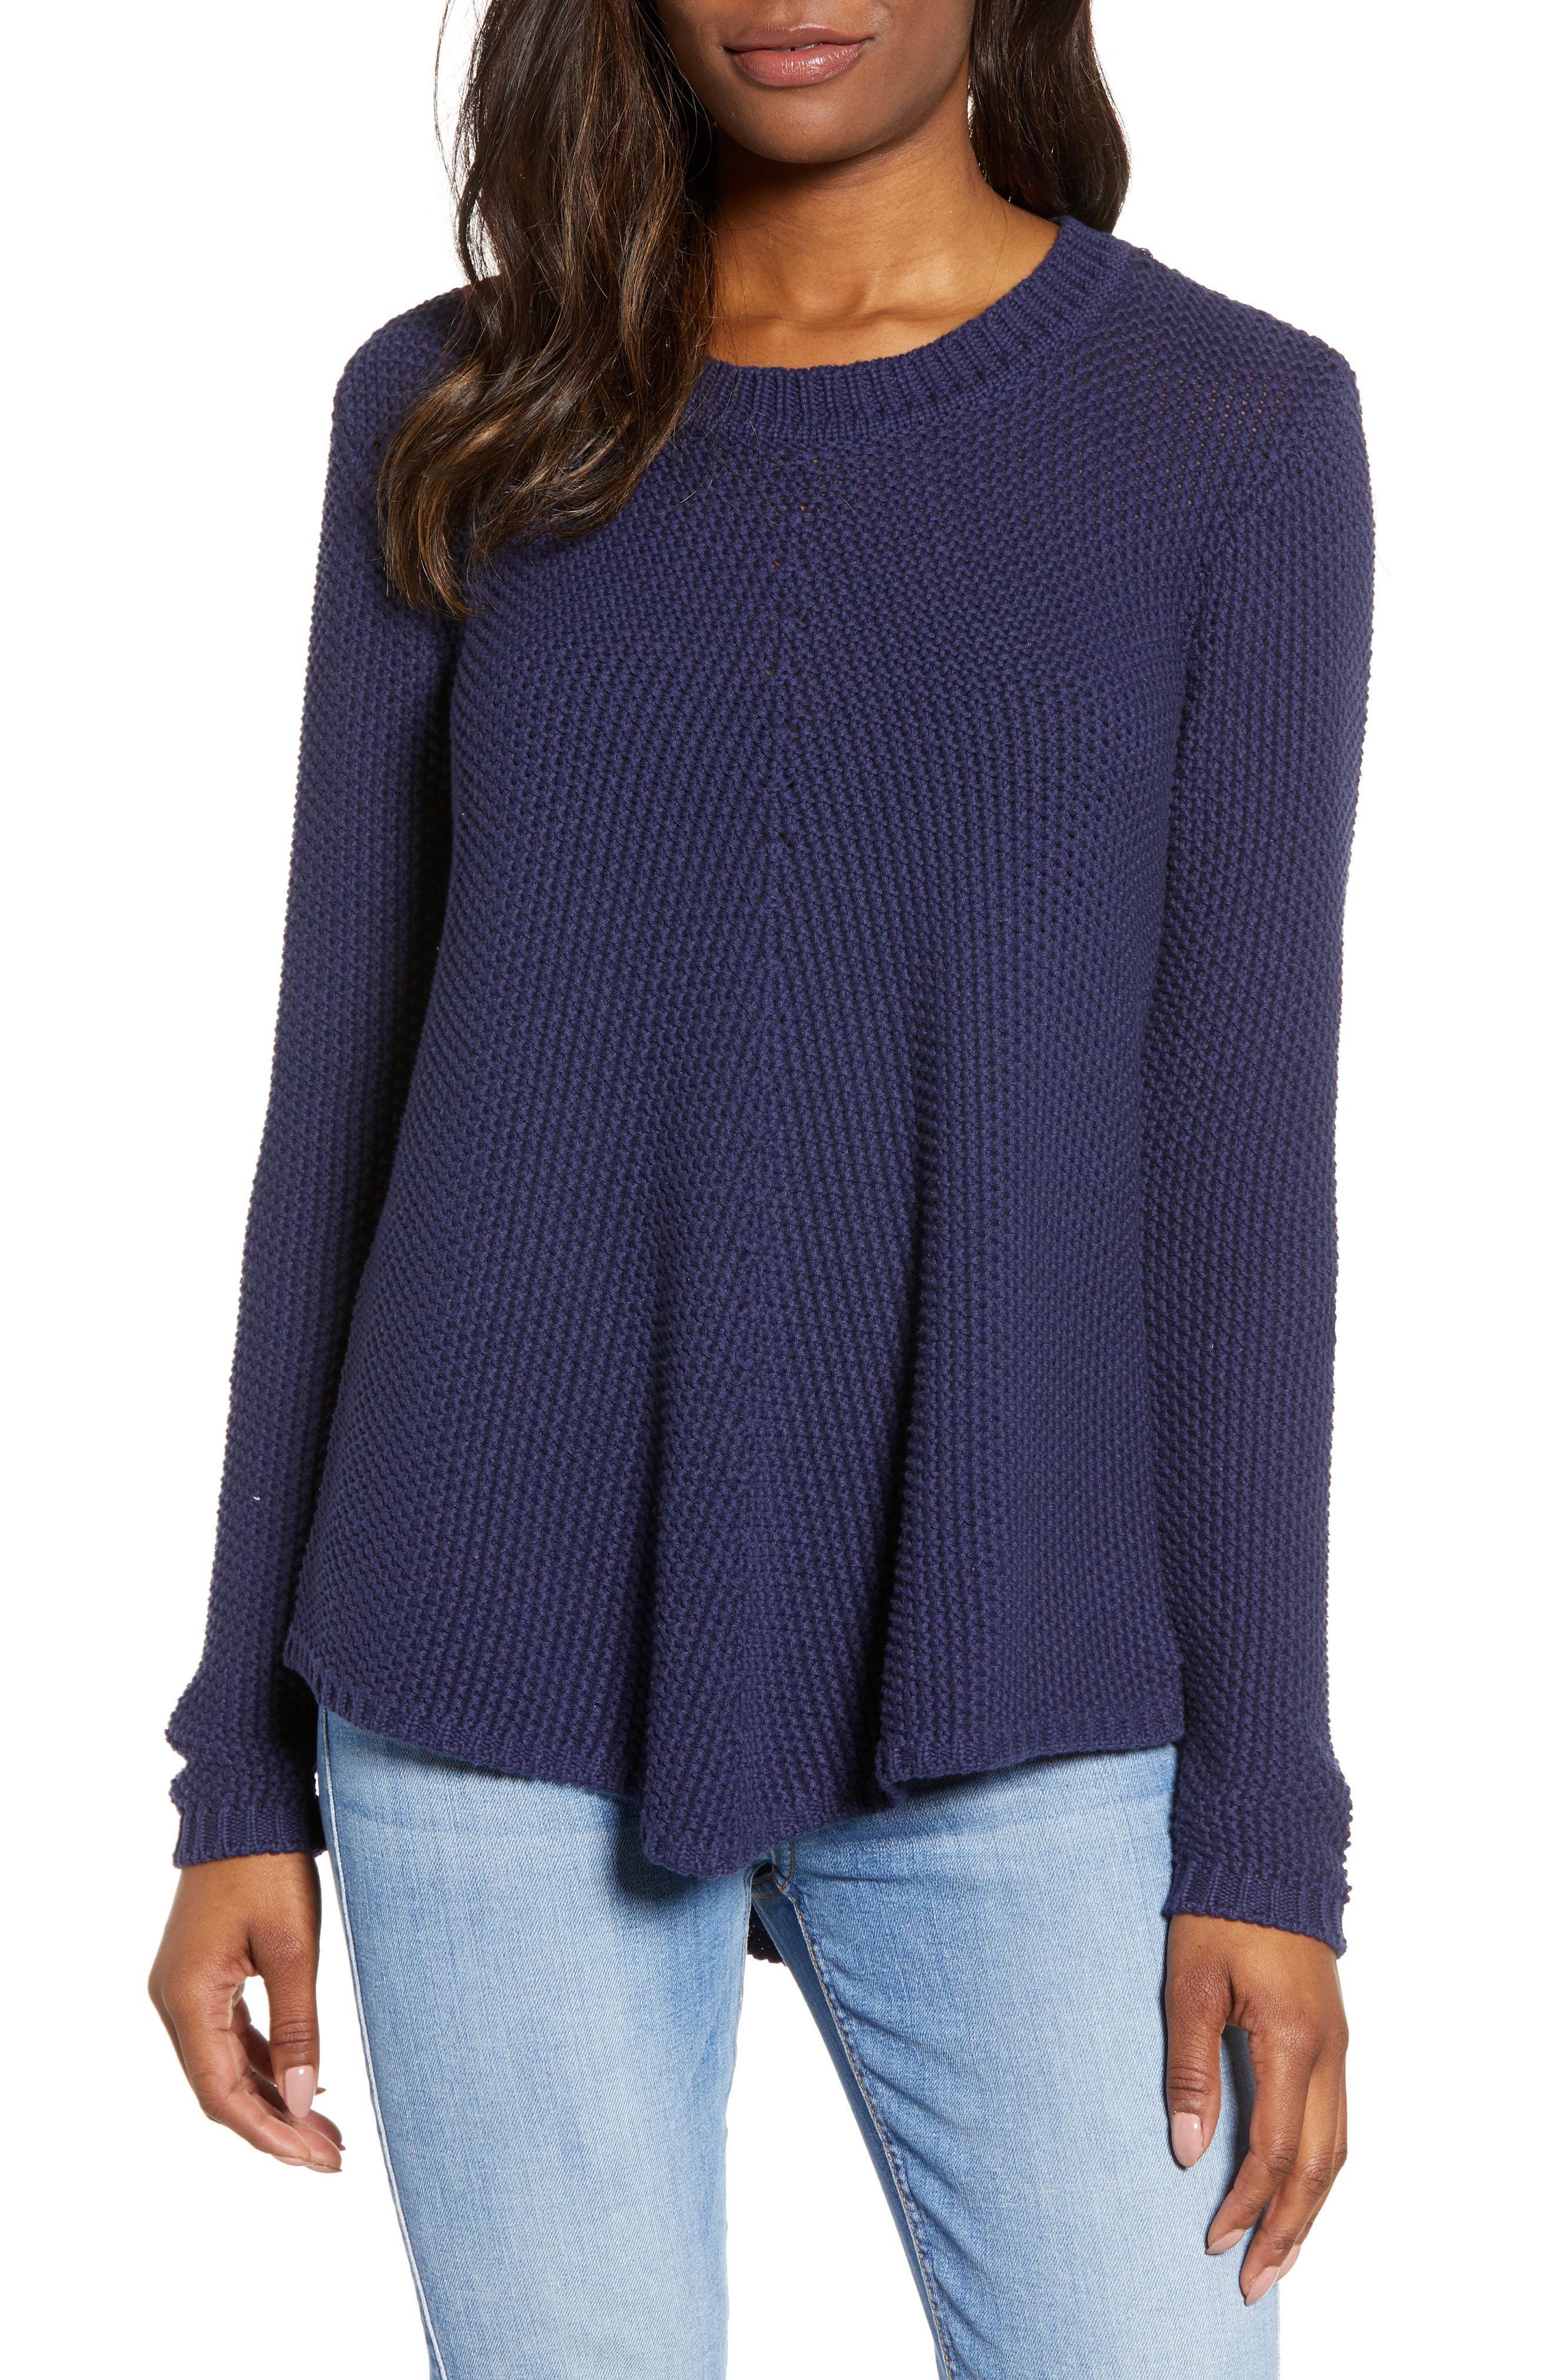 839ab1c1f67 Lyst - Caslon Caslon Stitch Stripe Sweater in Blue